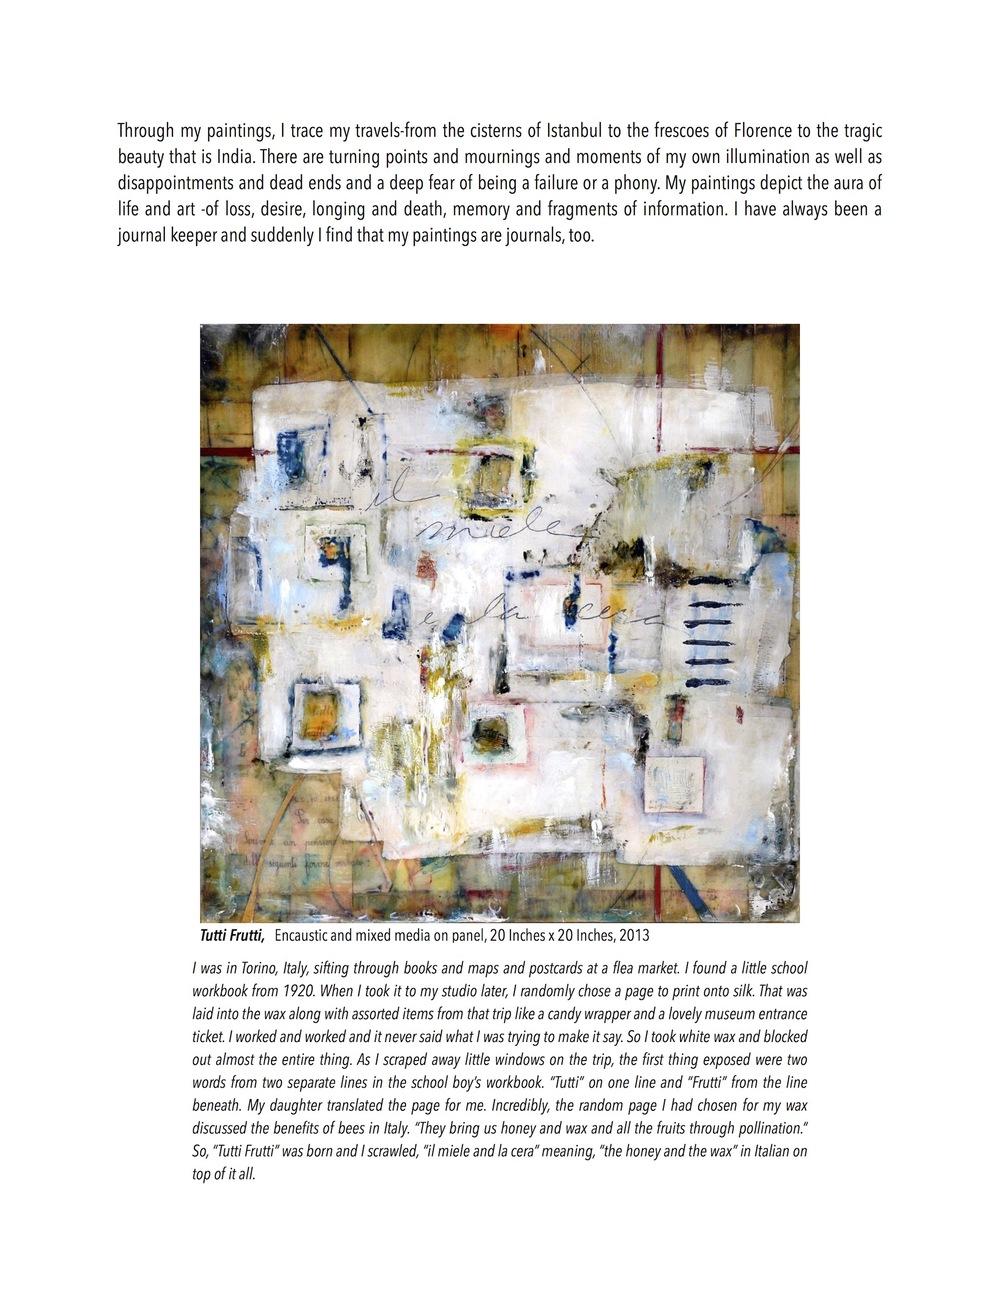 Lisa Bick - EAI Online Magazine - Artist Statement - June 2015-p6.jpg